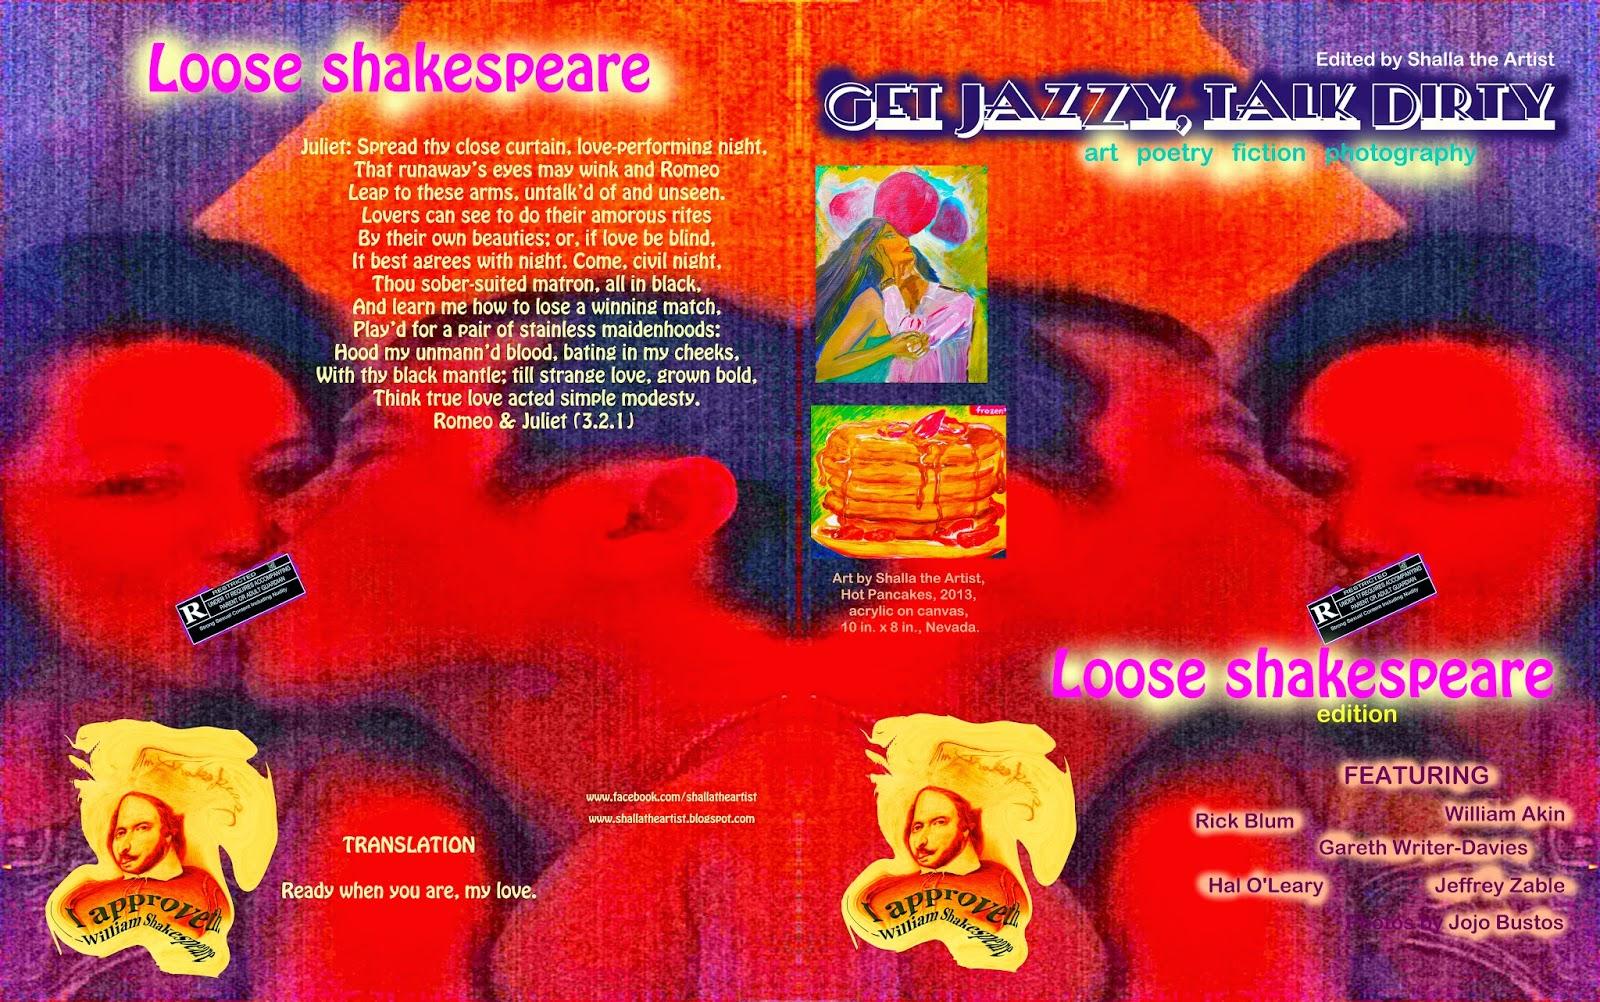 http://www.amazon.com/Shalla-DeGuzman/e/B0035QPQ5A/ref=dp_byline_cont_book_1